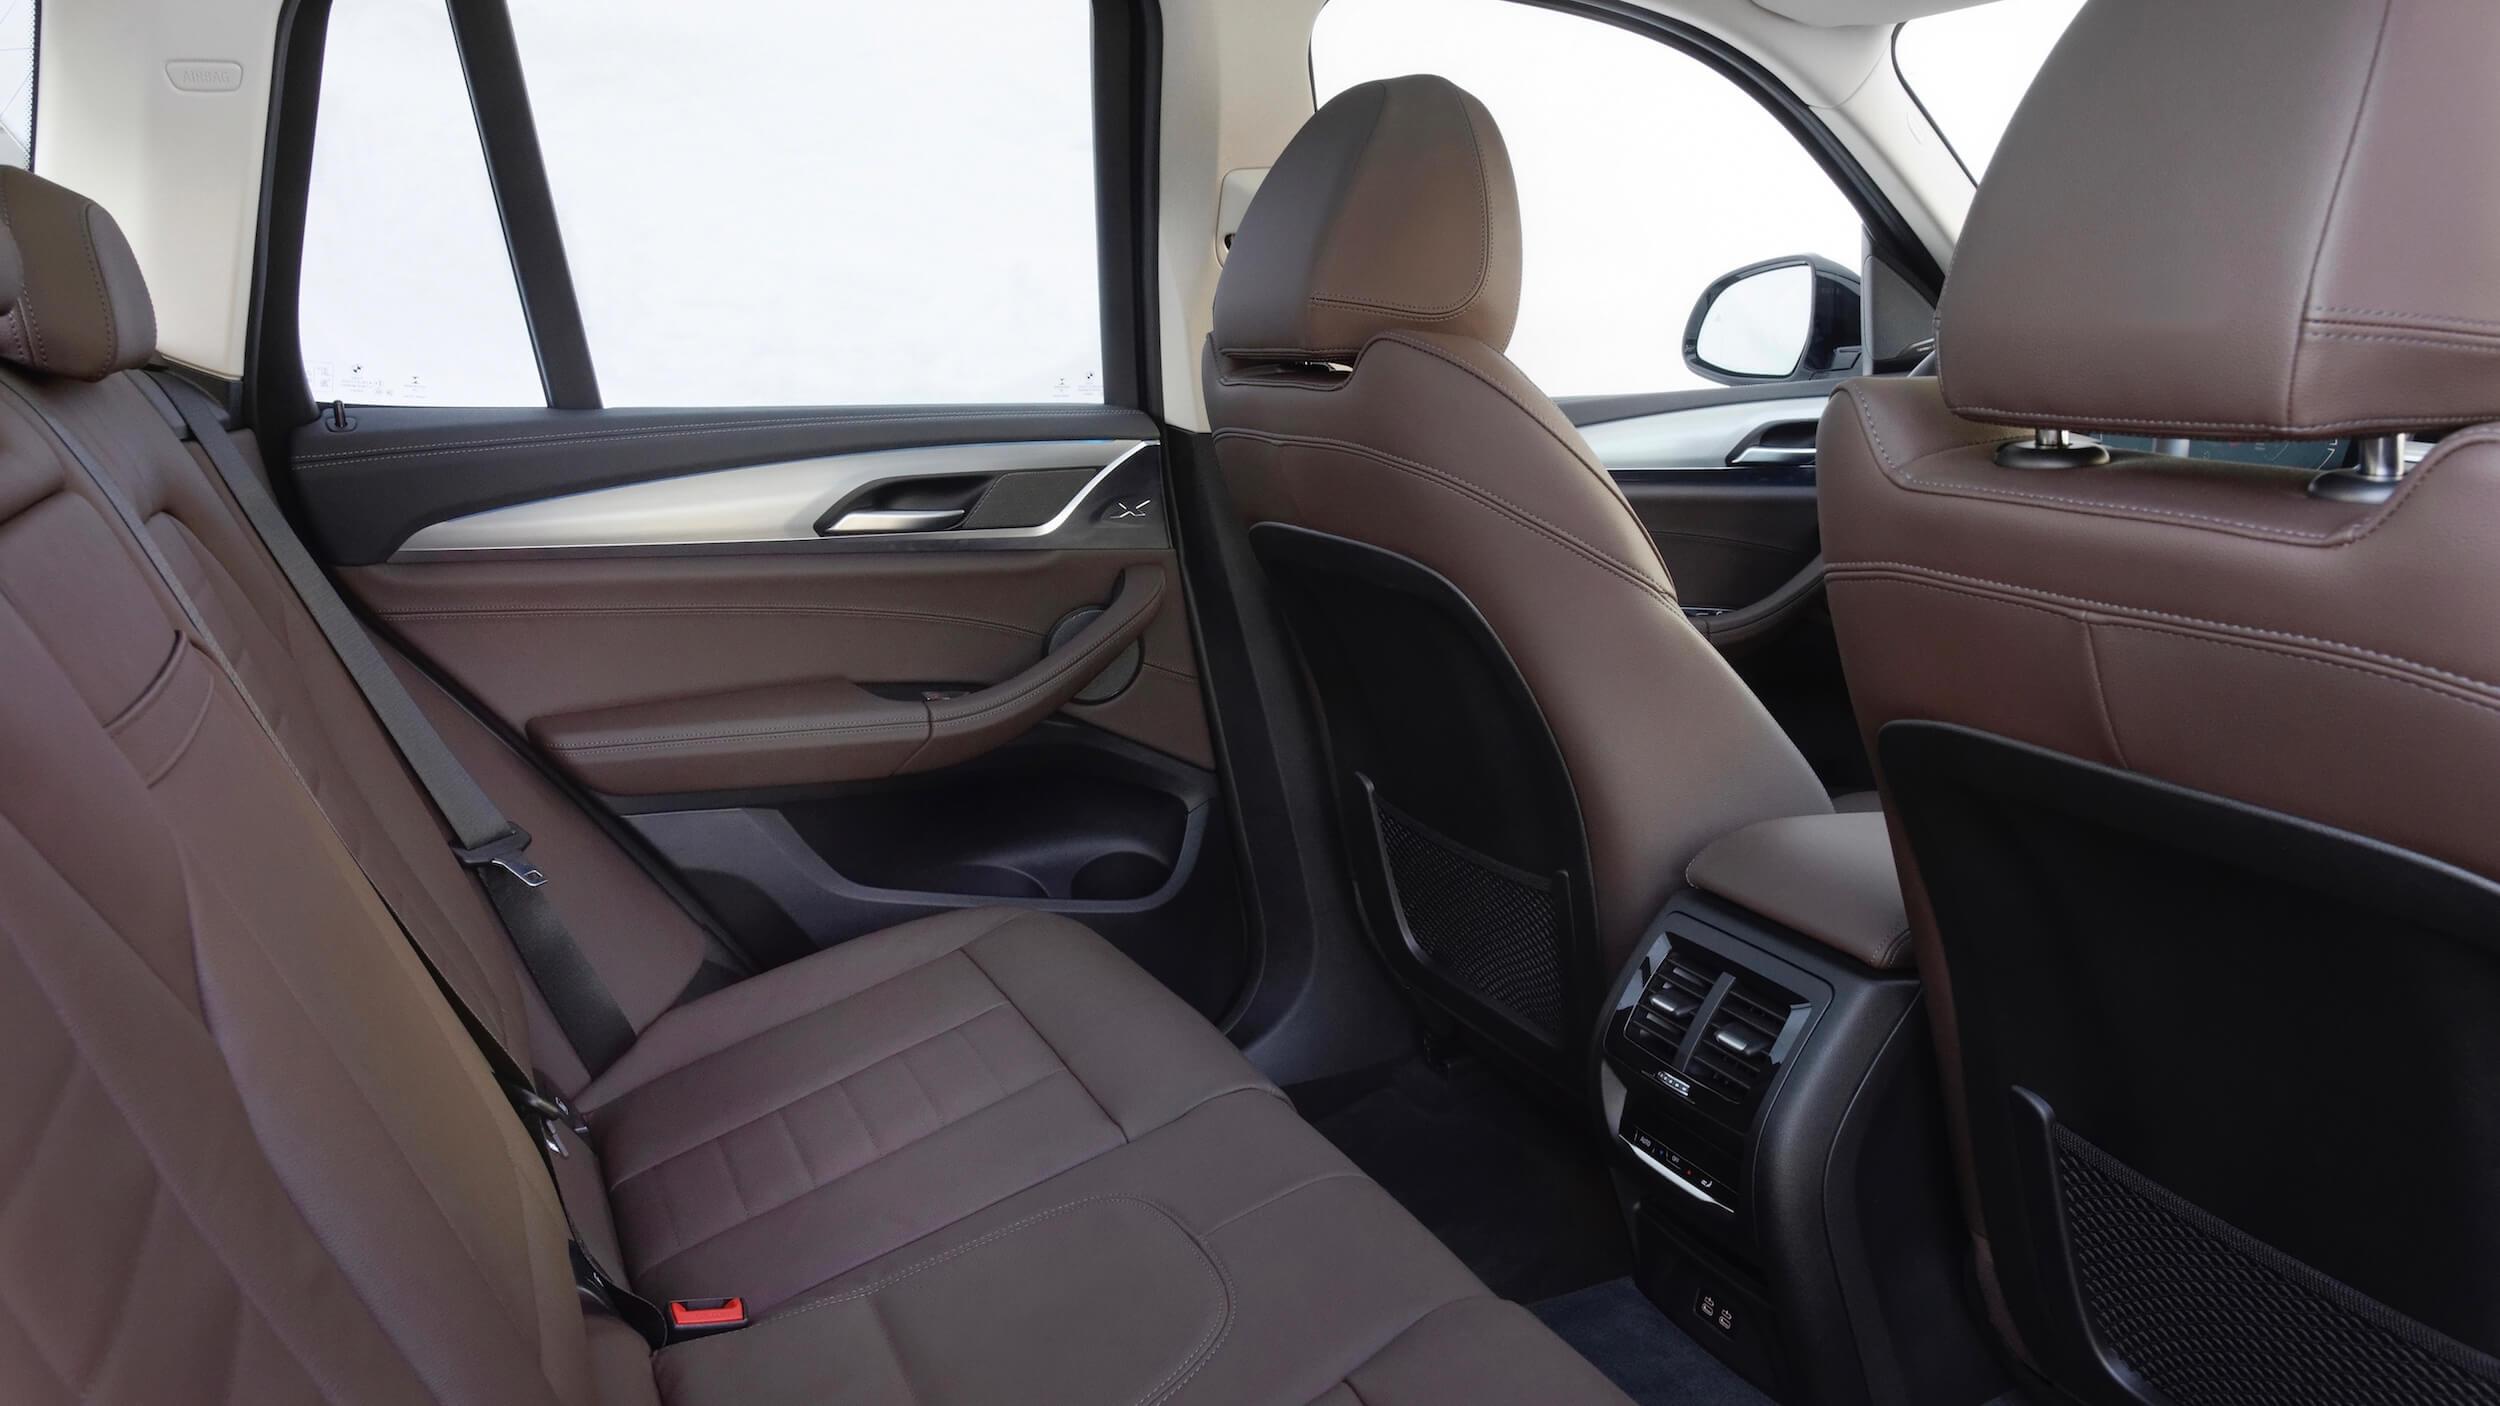 BMW iX3 banco traseiro